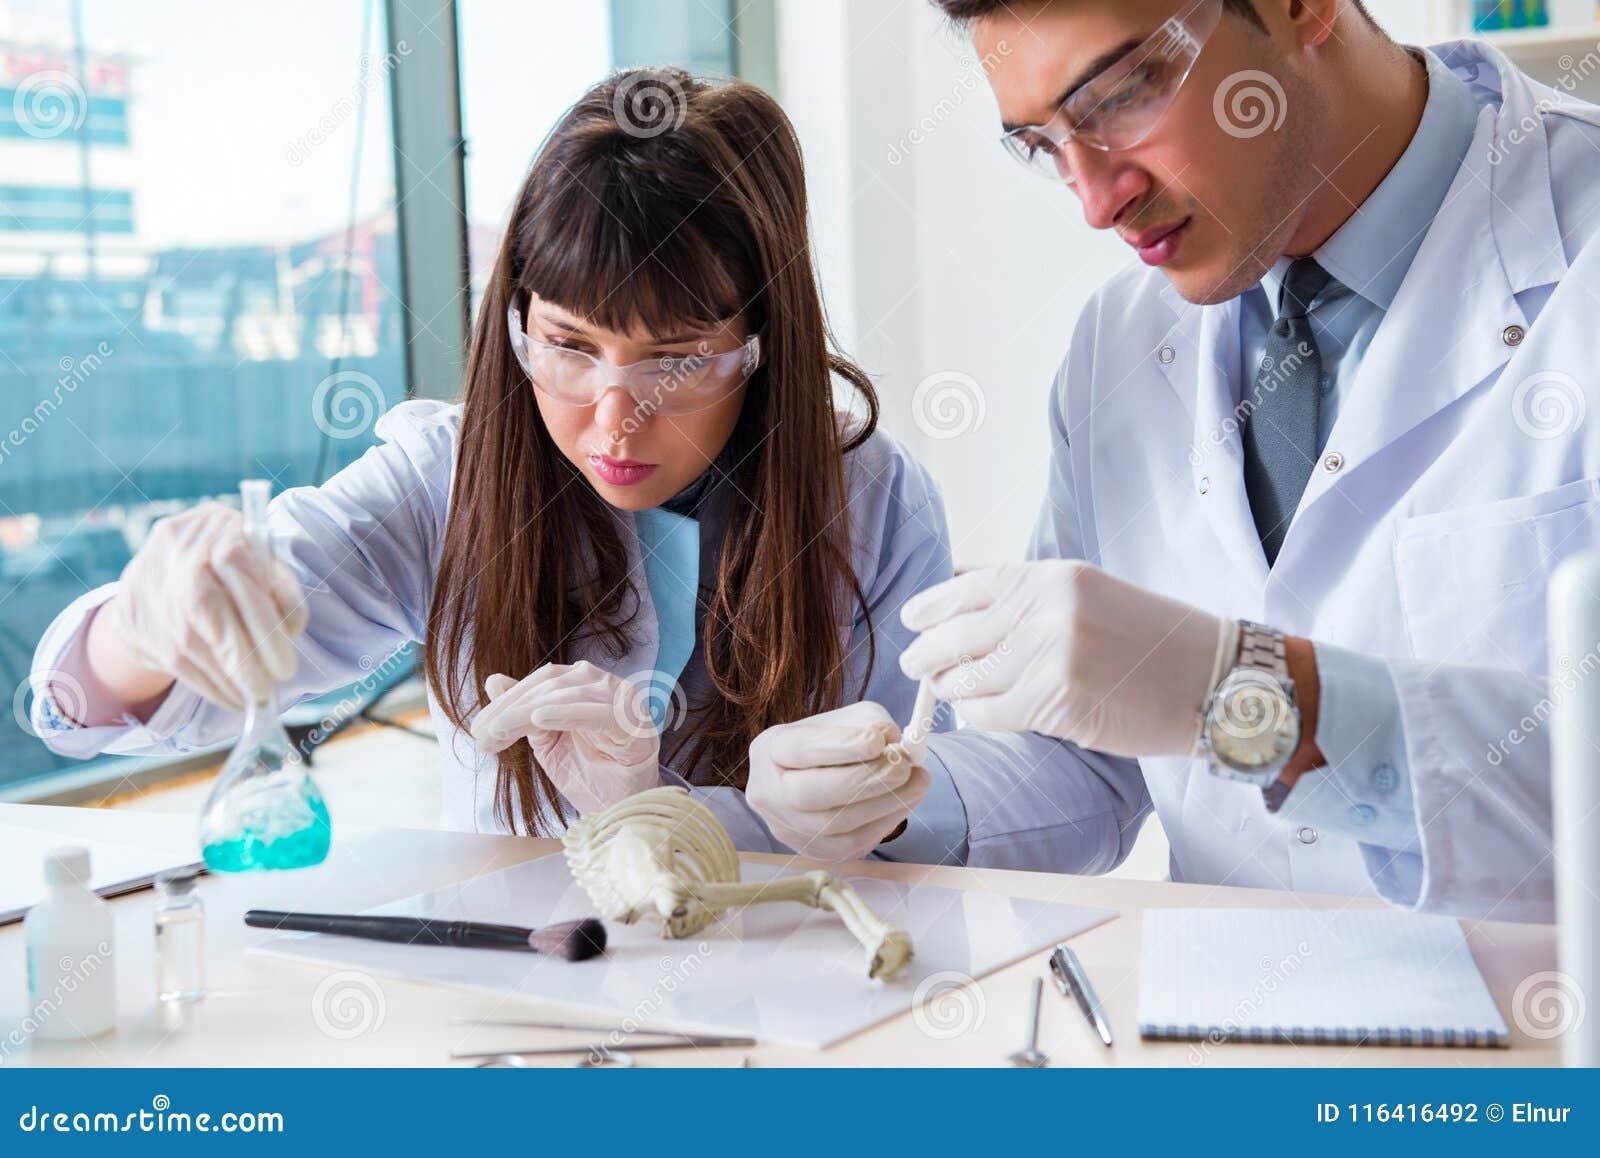 The paleontologists looking at bones of extinct animals